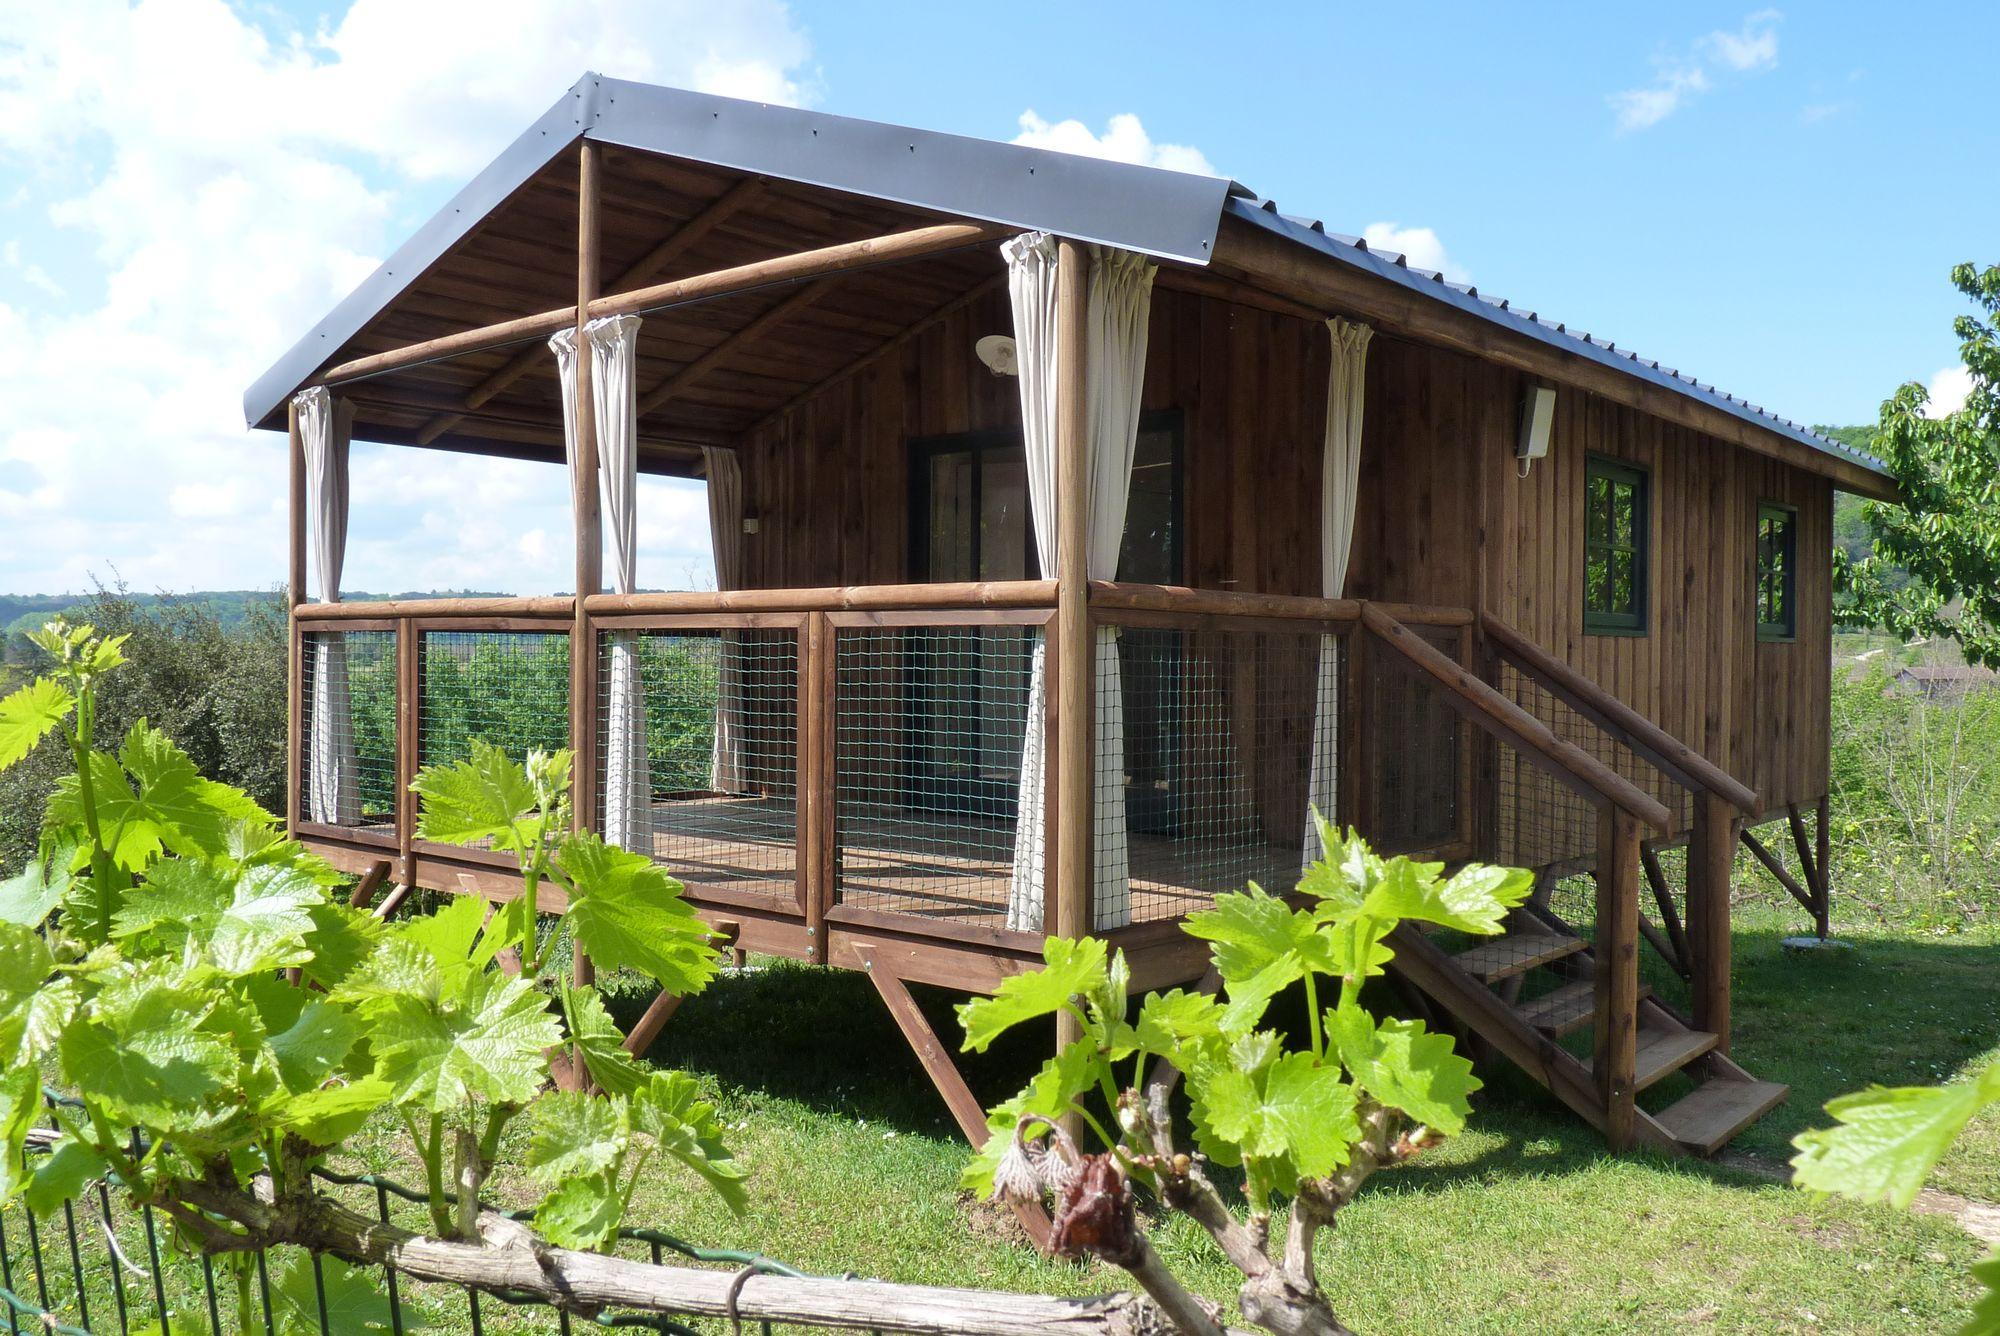 location de cabane en camping dordogne sarlat